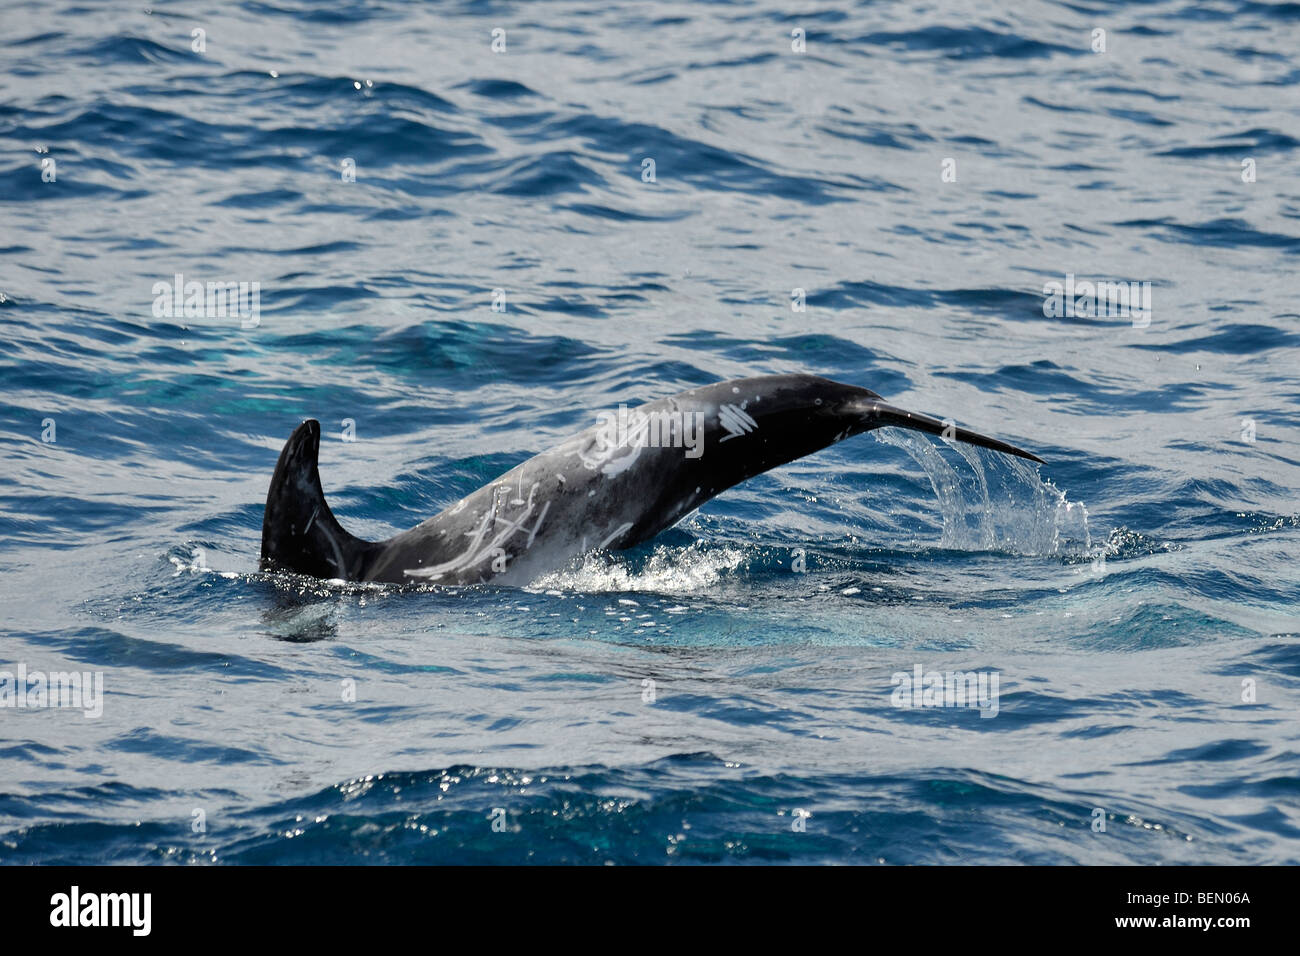 Risso's Dolphin, Grampus griseus, fluking before a dive, Azores, Atlantic Ocean. - Stock Image